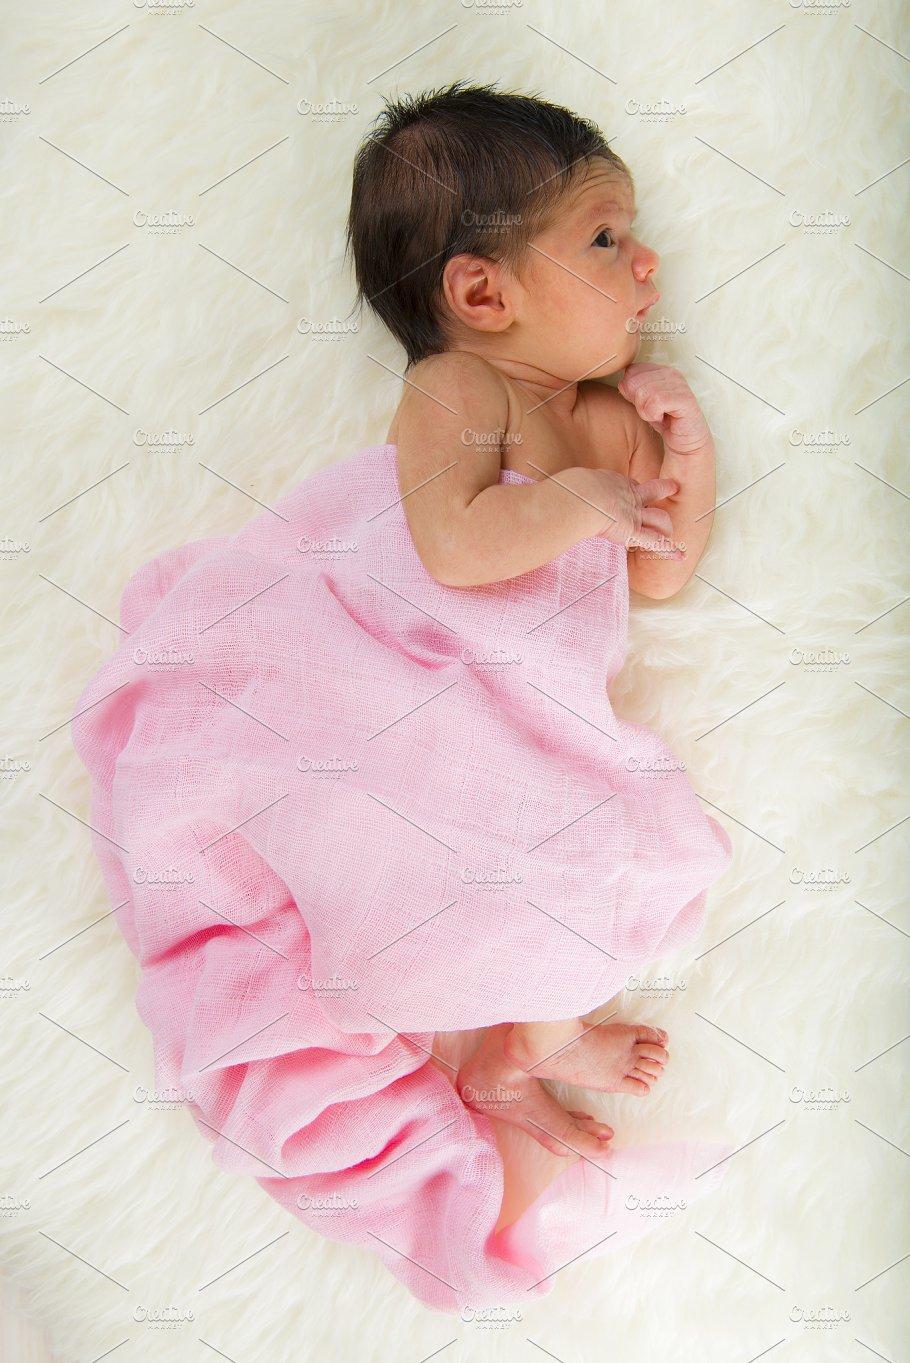 Newborn baby girl people photos creative market